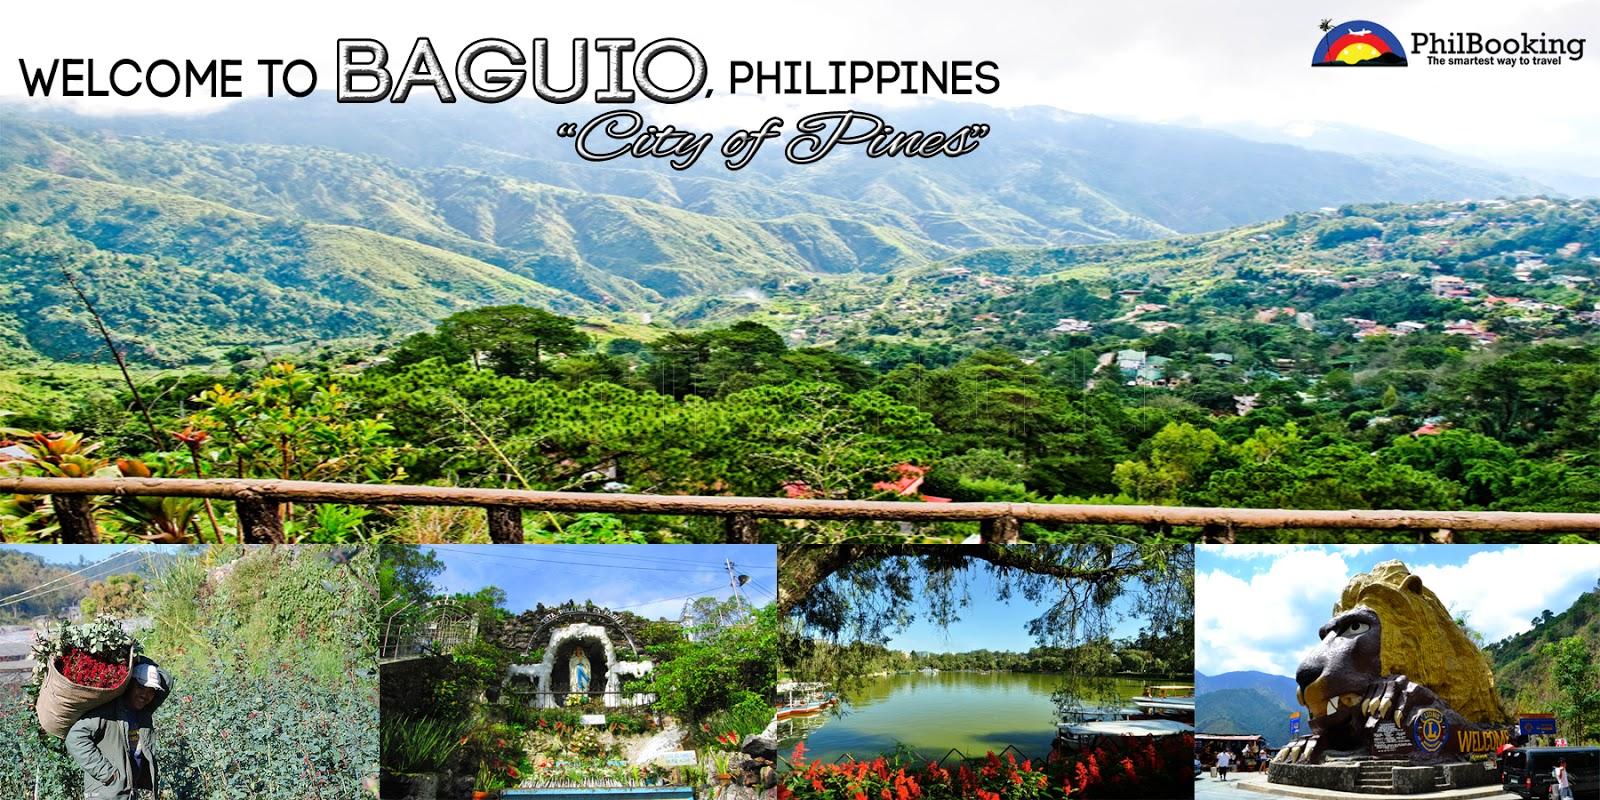 Dating Place - Review of Burnham Park Baguio Philippines - TripAdvisor